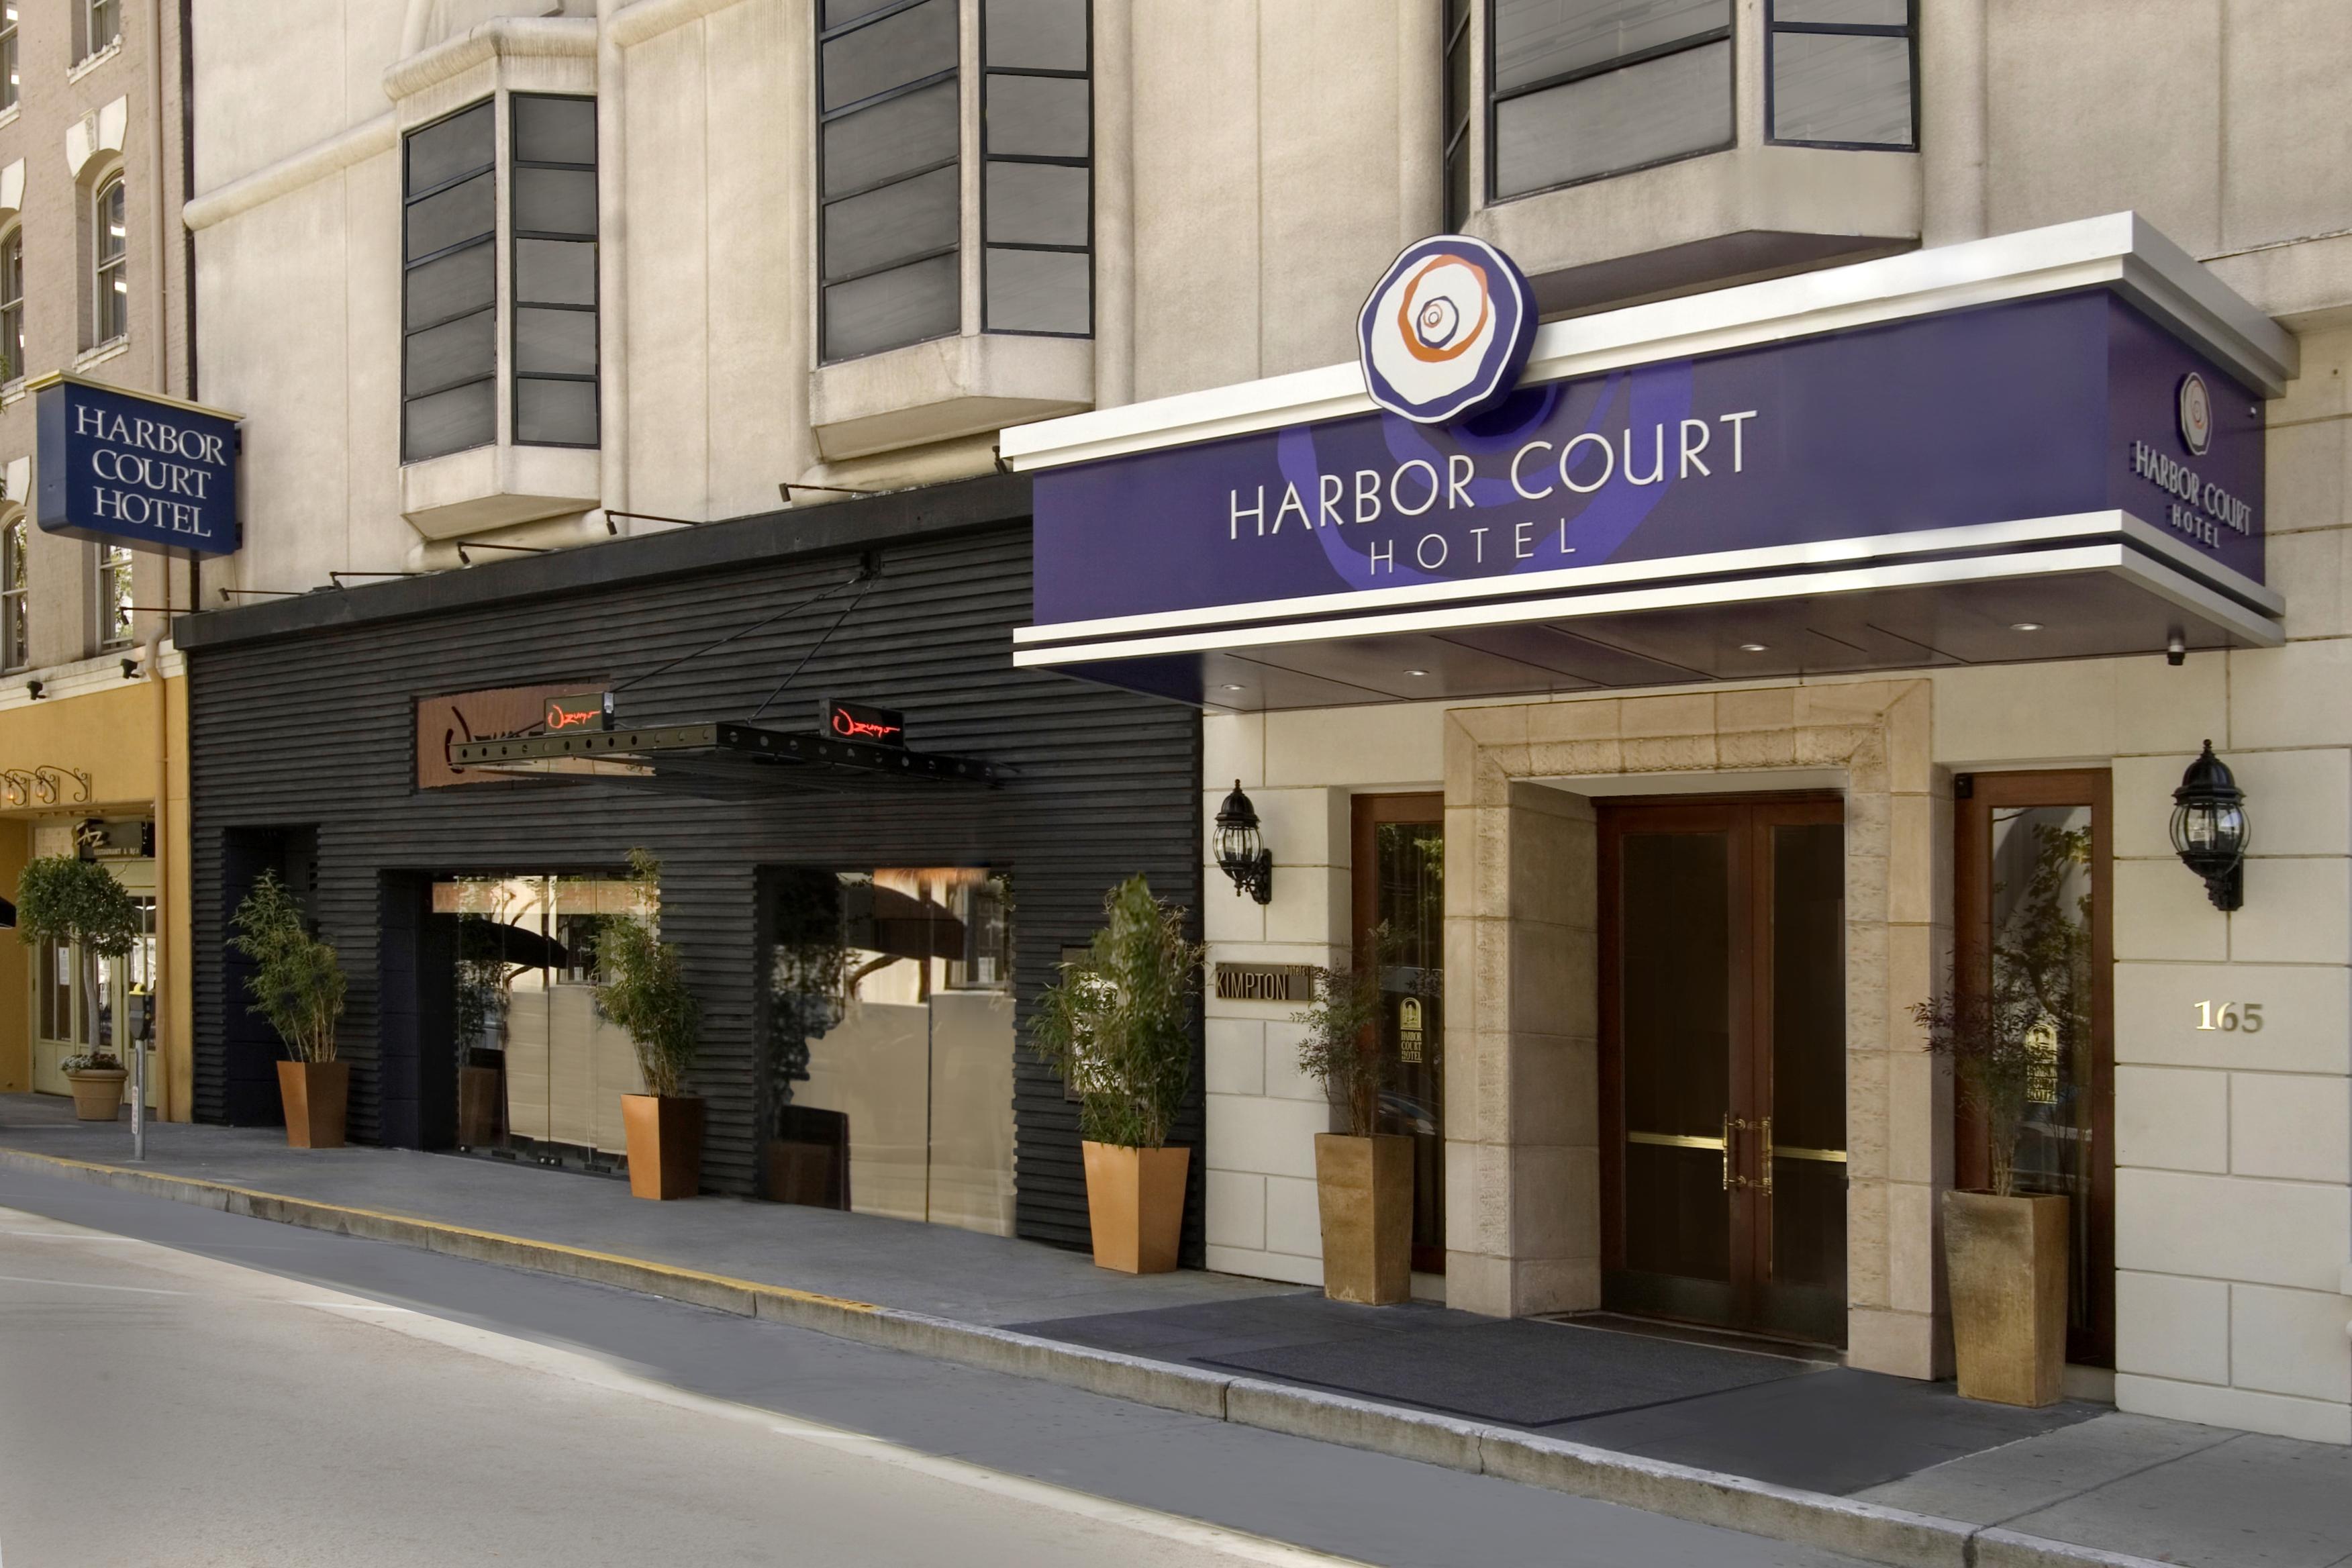 Harbor Court Hotel